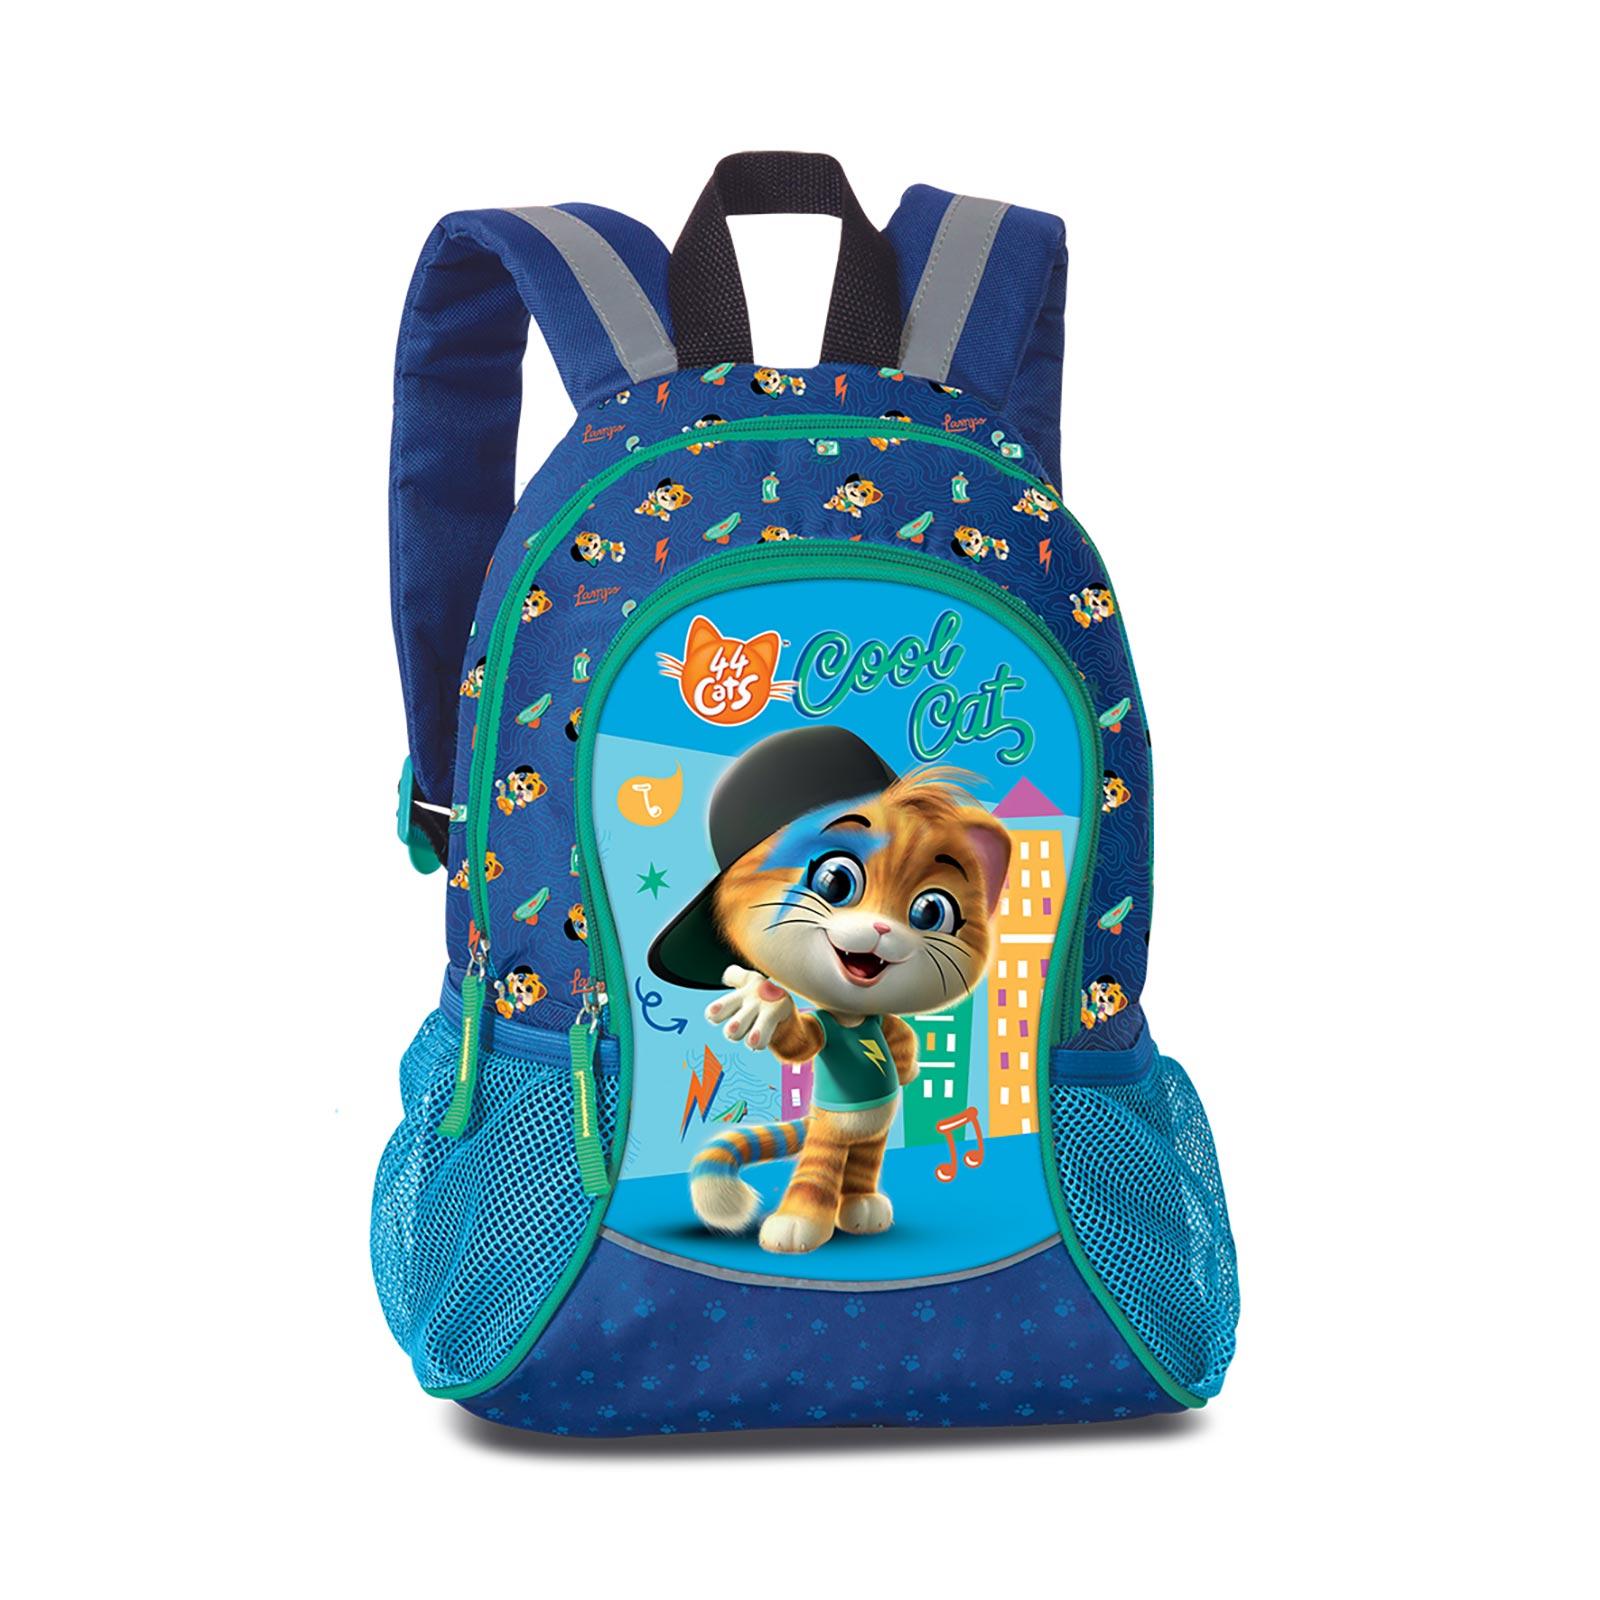 Fabrizio Kids 44 Cats Rucksack 35 cm - Blau 20627-0500